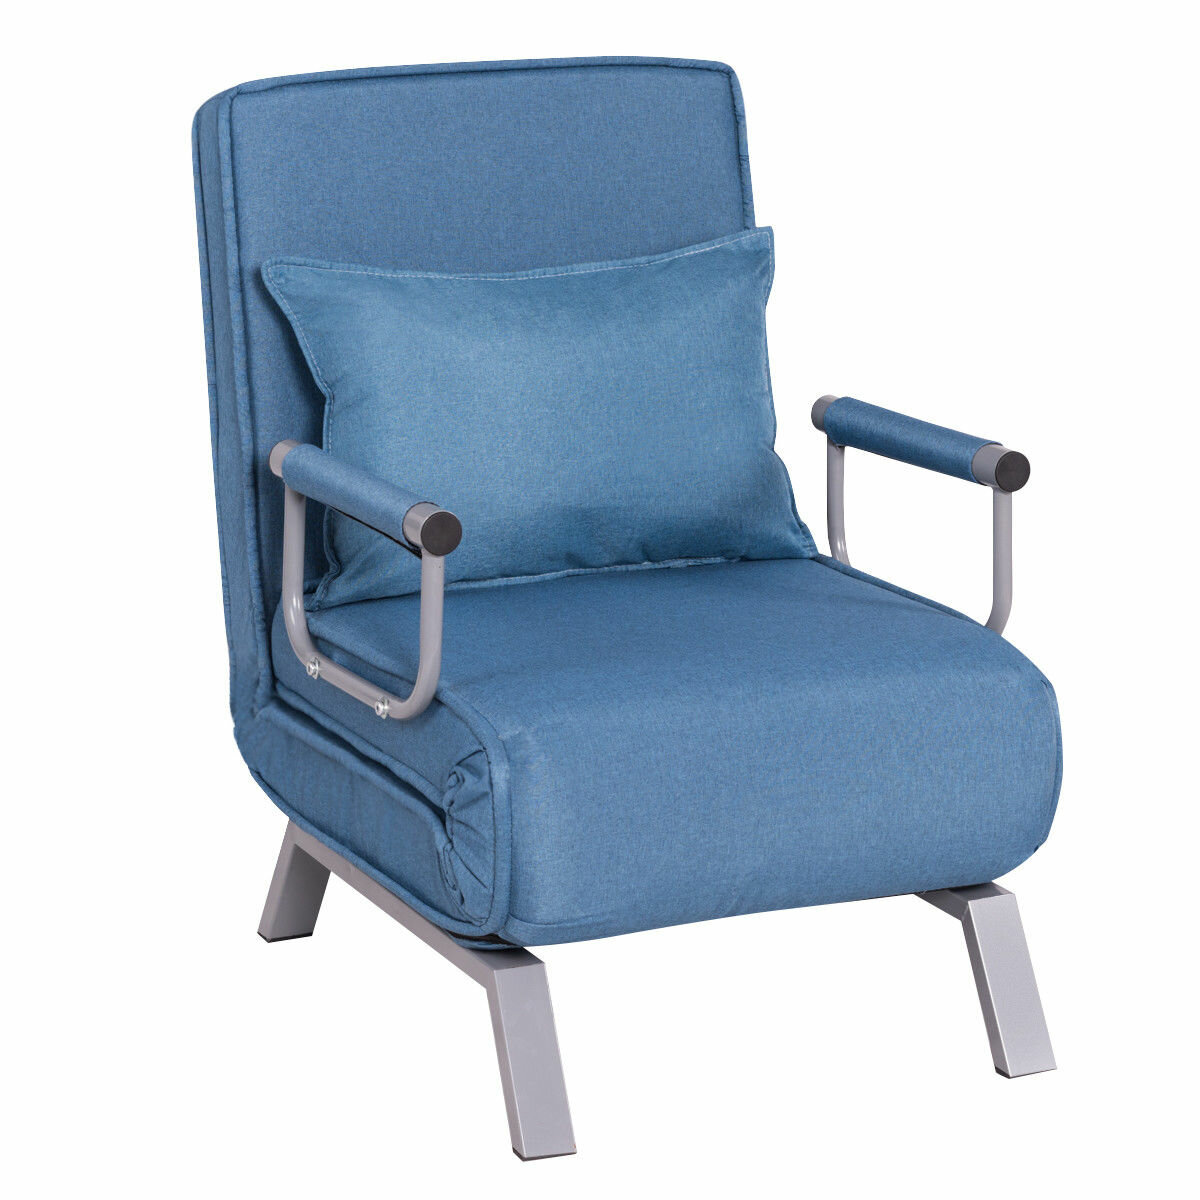 Ebern Designs Woodbluff Folding Convertible Sofa Bed | Wayfair